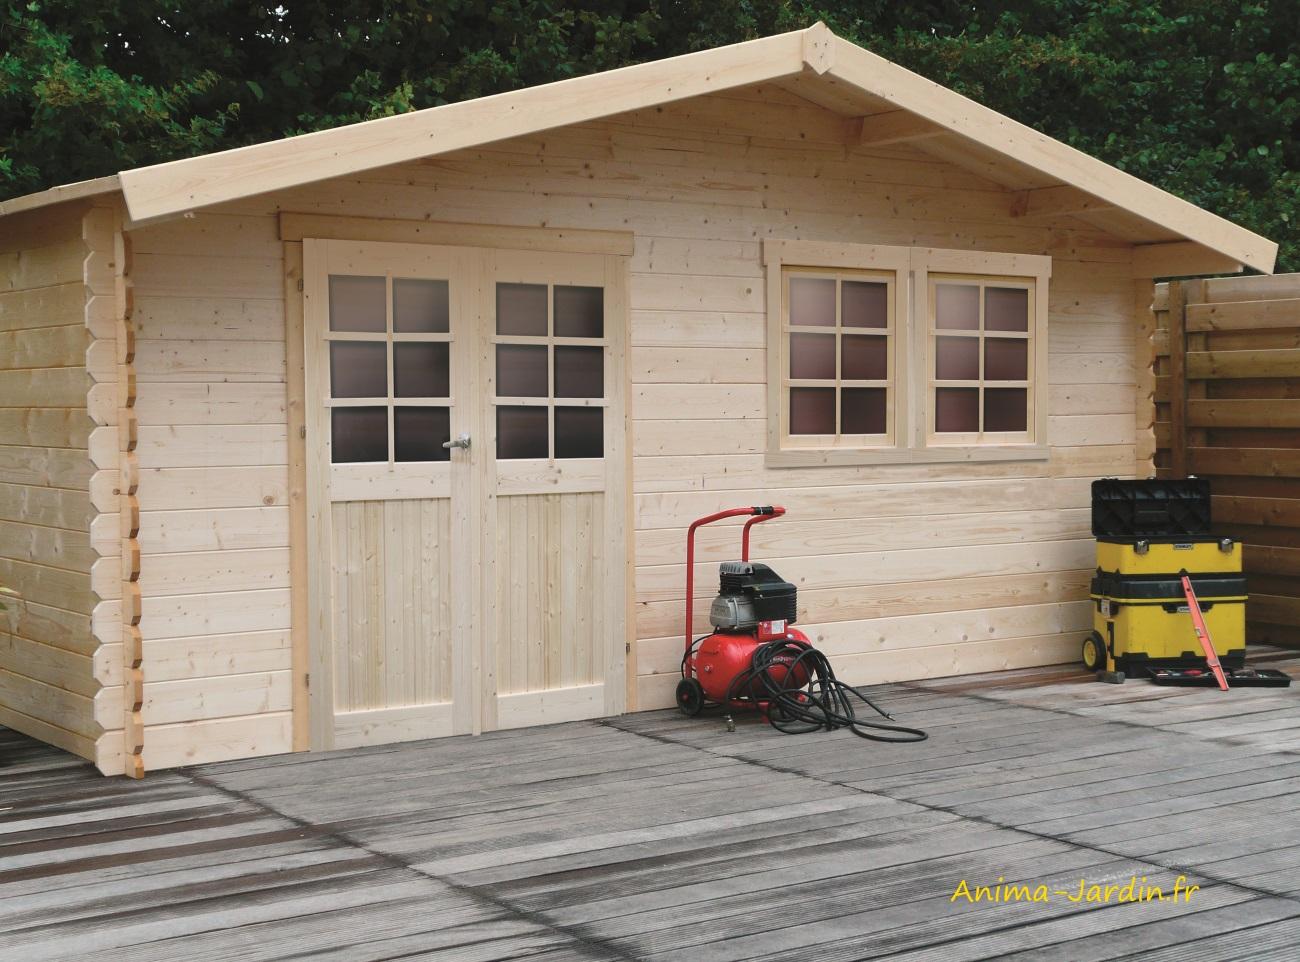 Grande Cabane De Jardin Pas Cher grand abri de jardin en bois 28mm, vernier, 26m², porte